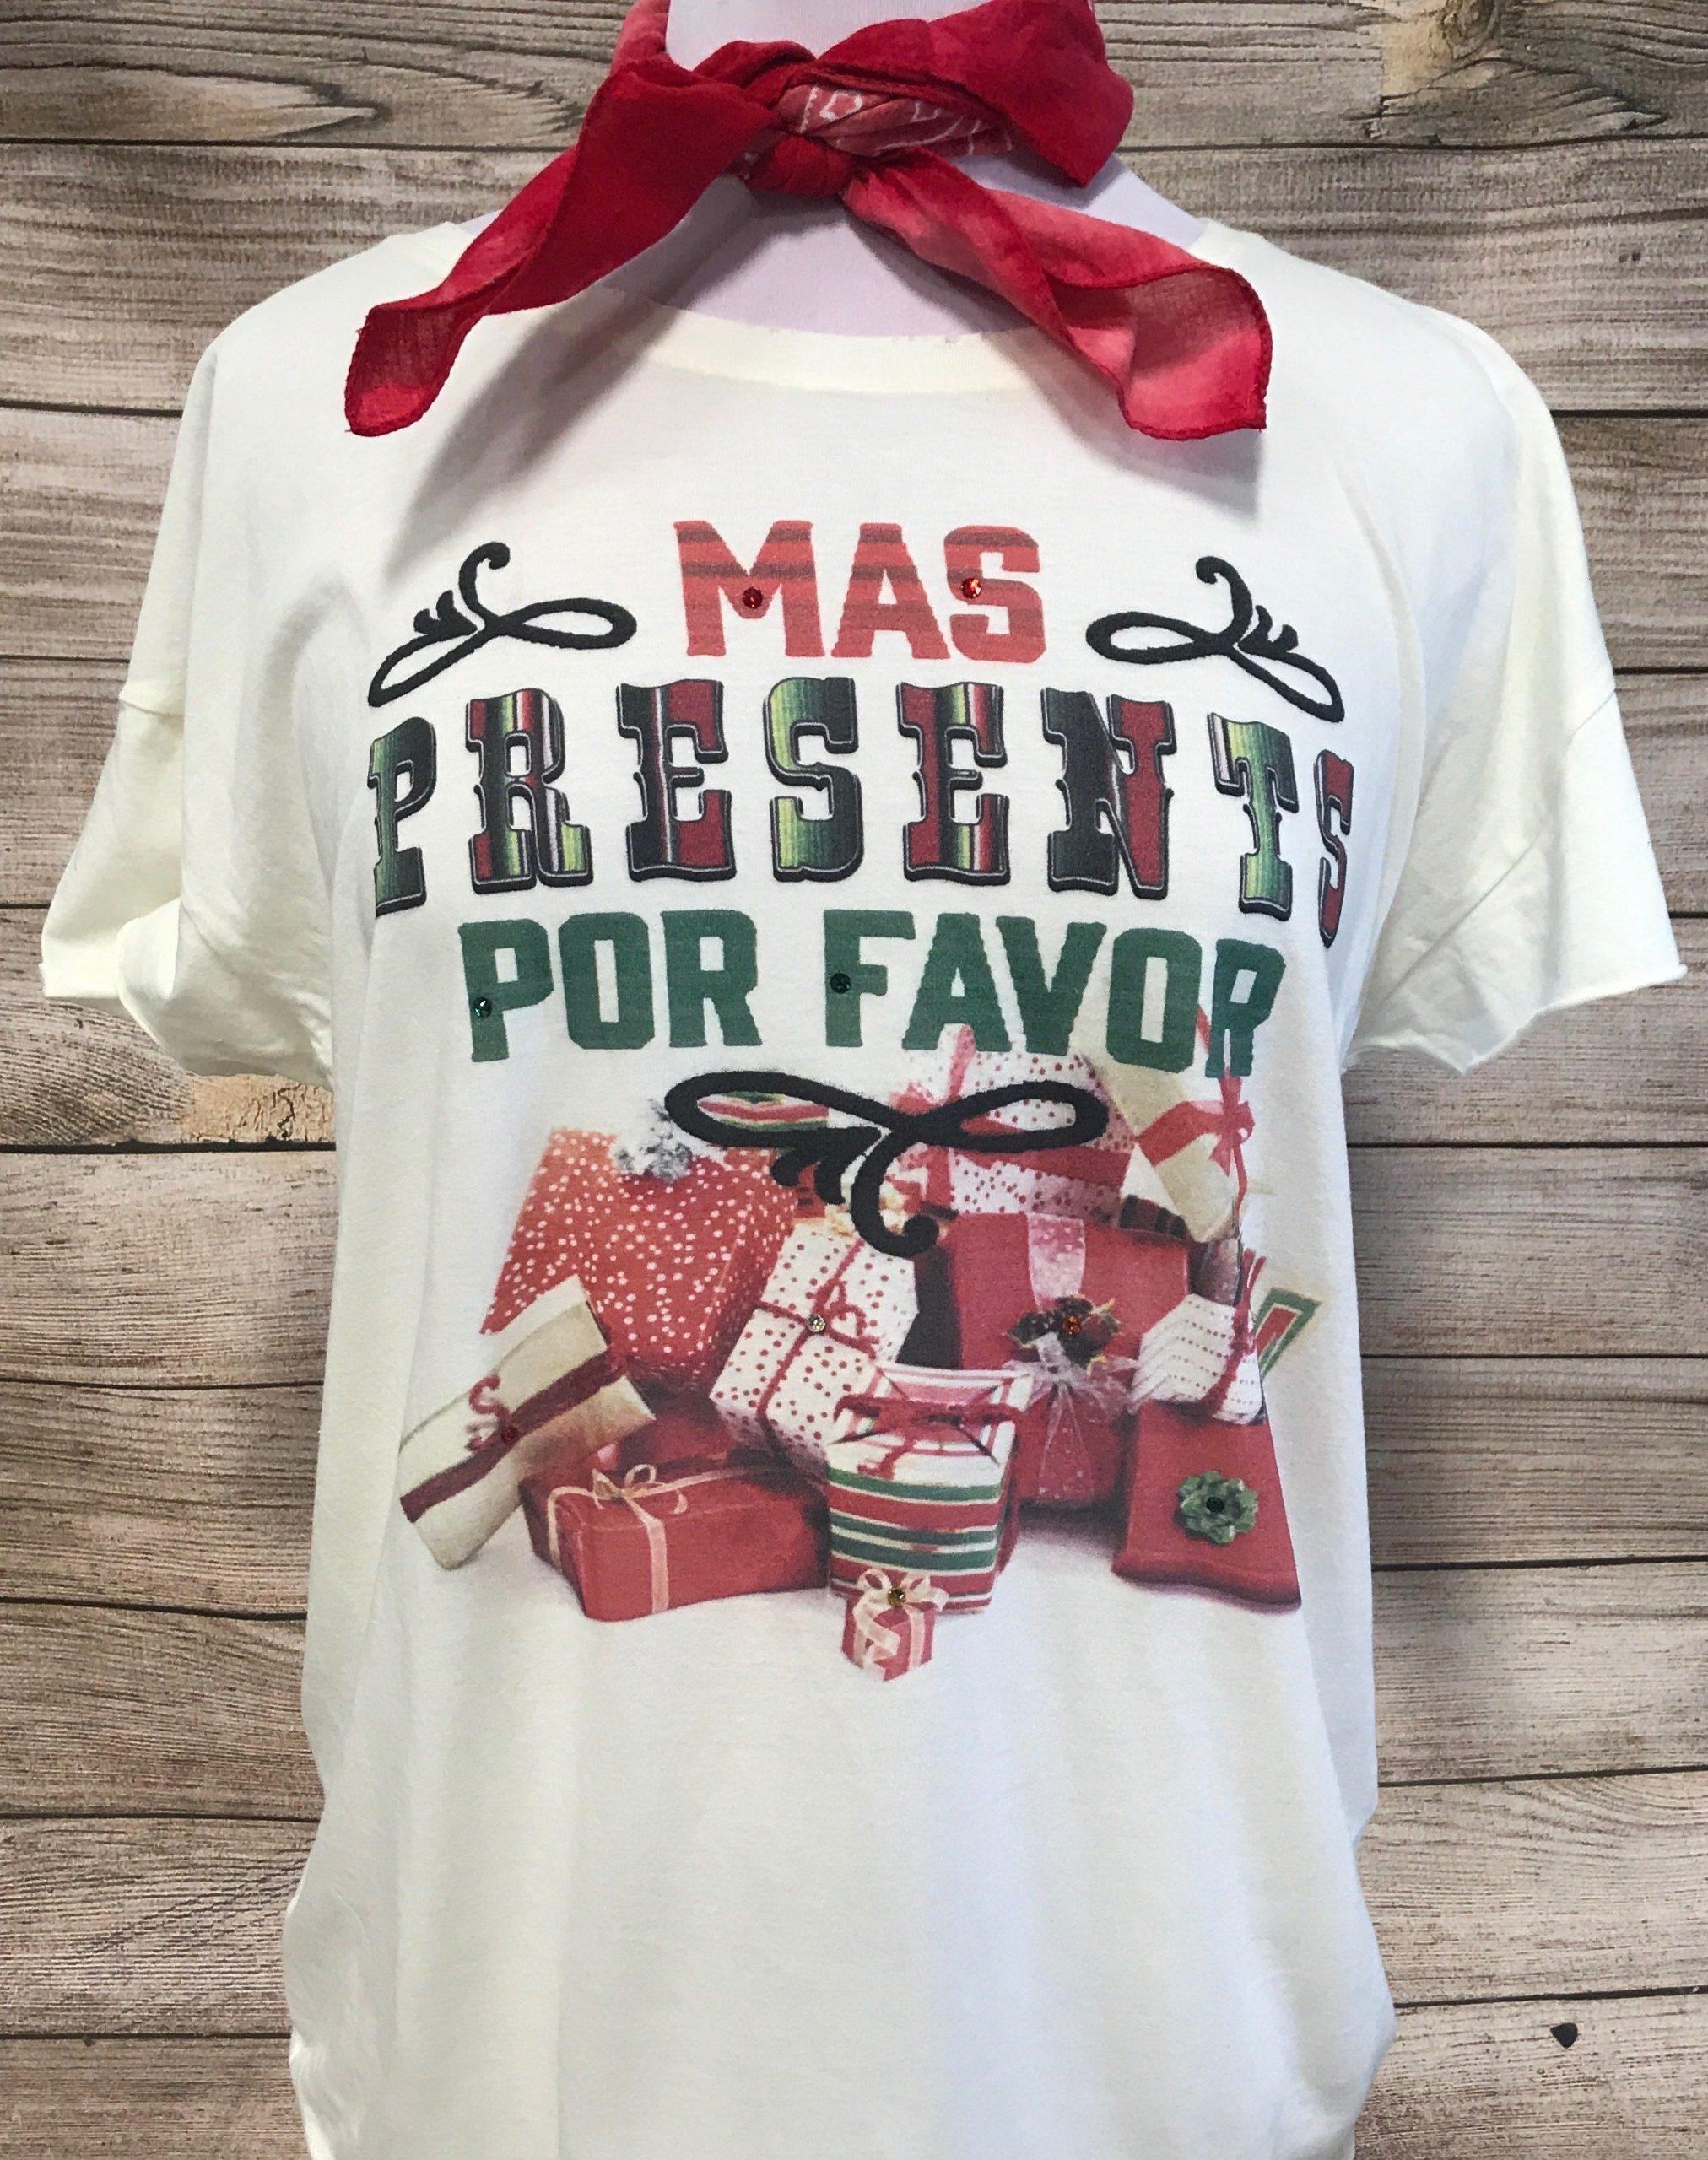 Mas Presents Por Favor on Cream Rocker Tee